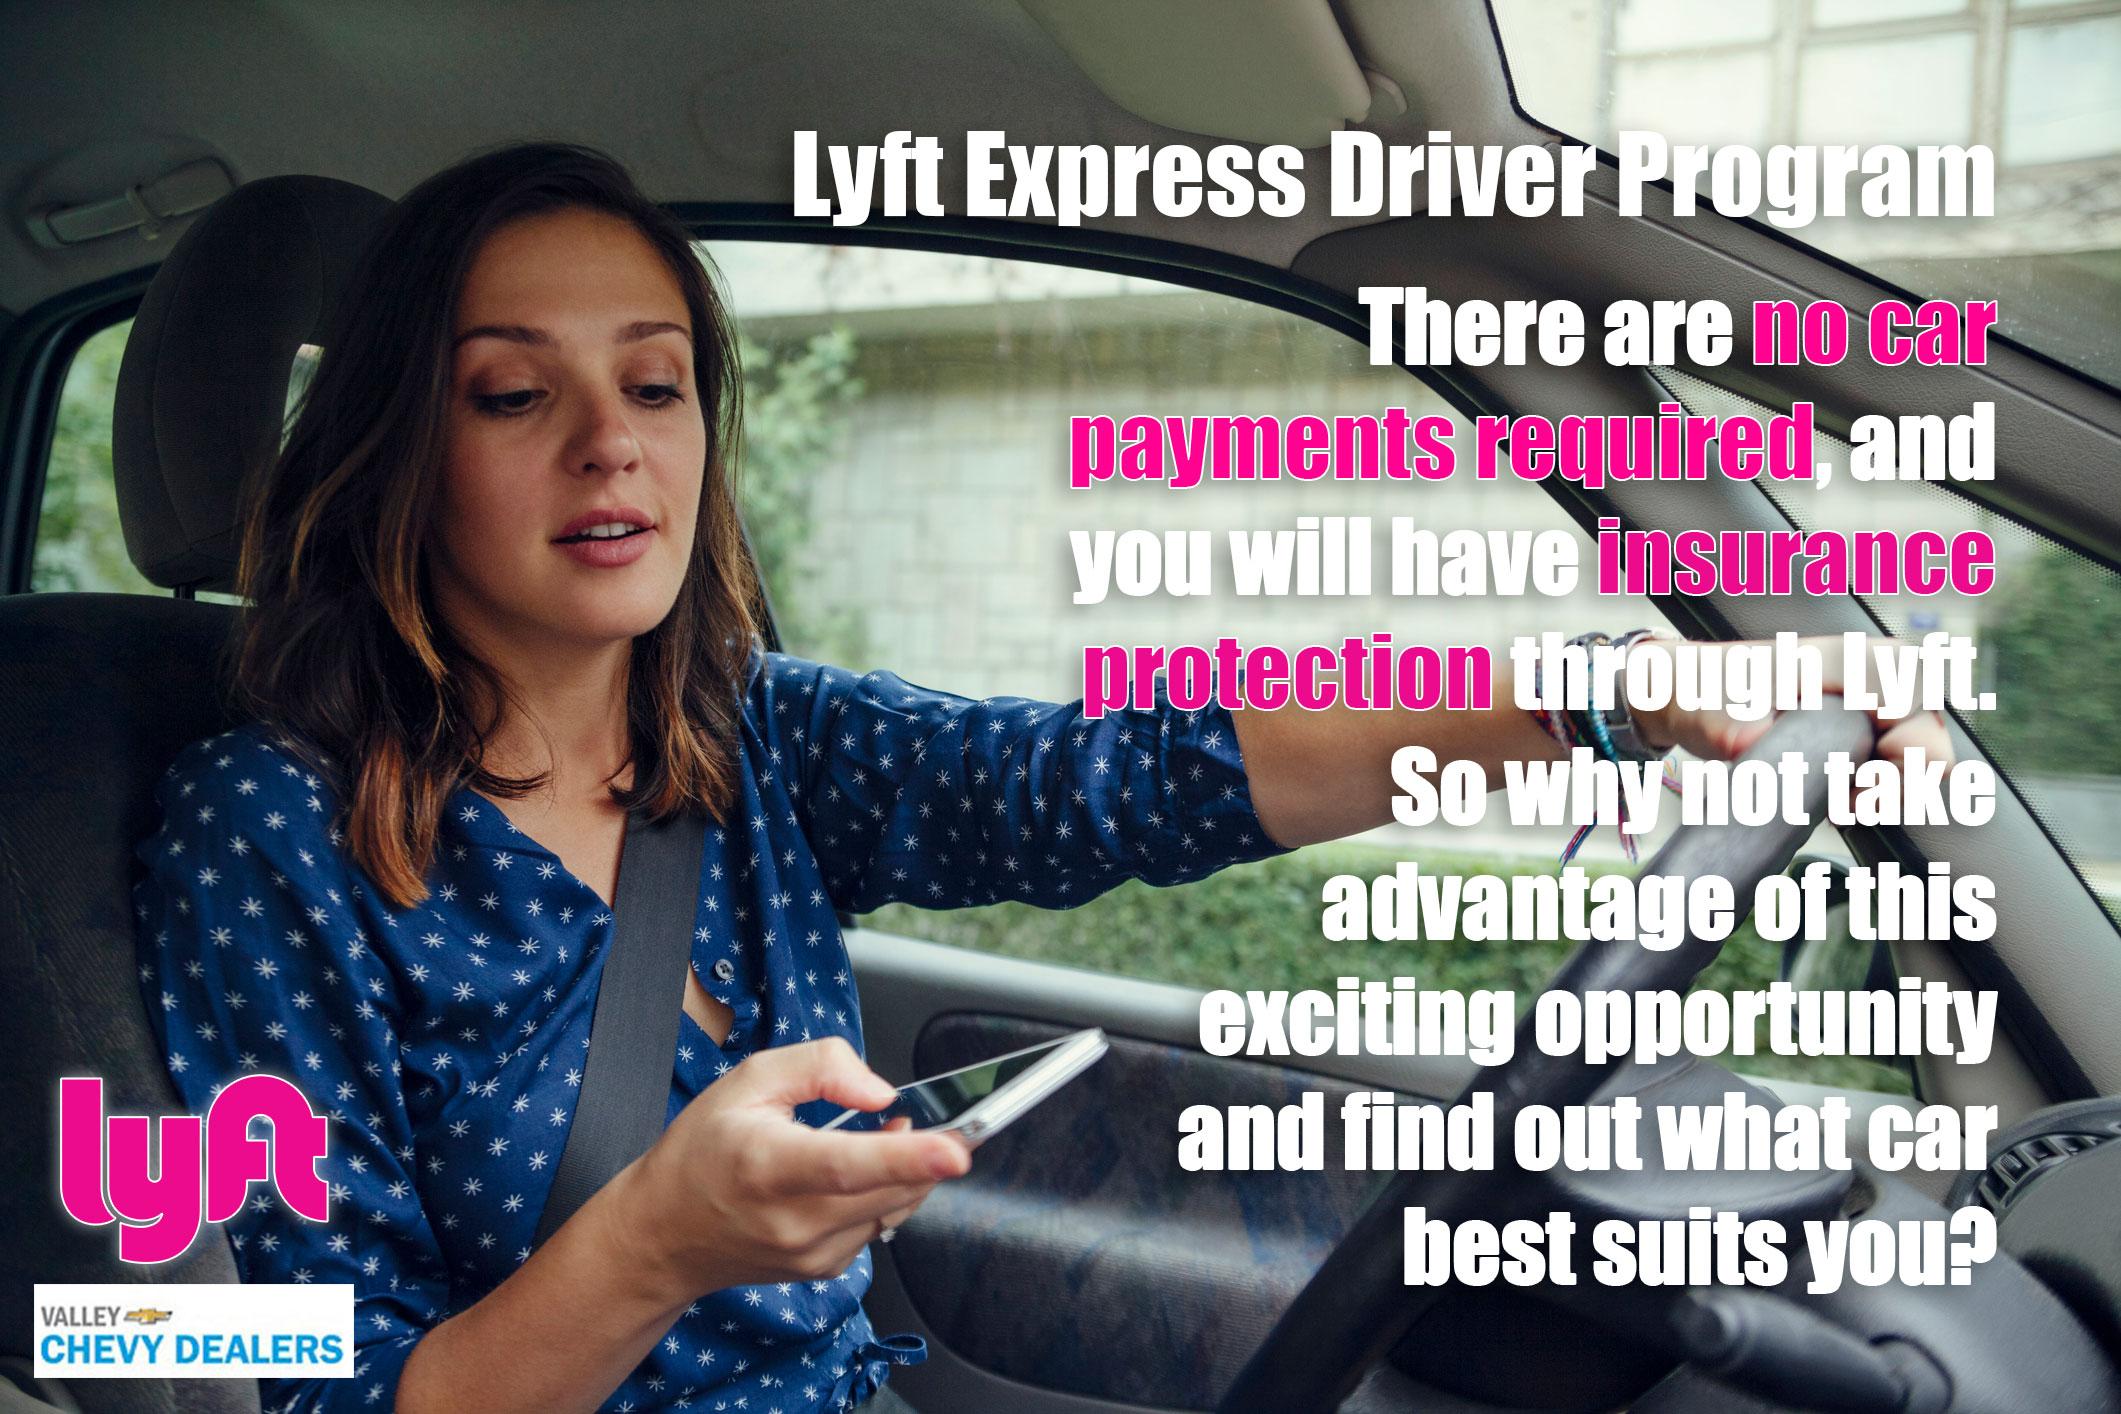 Valley Chevrolet - Lyft Express Driver Program: Test Drive